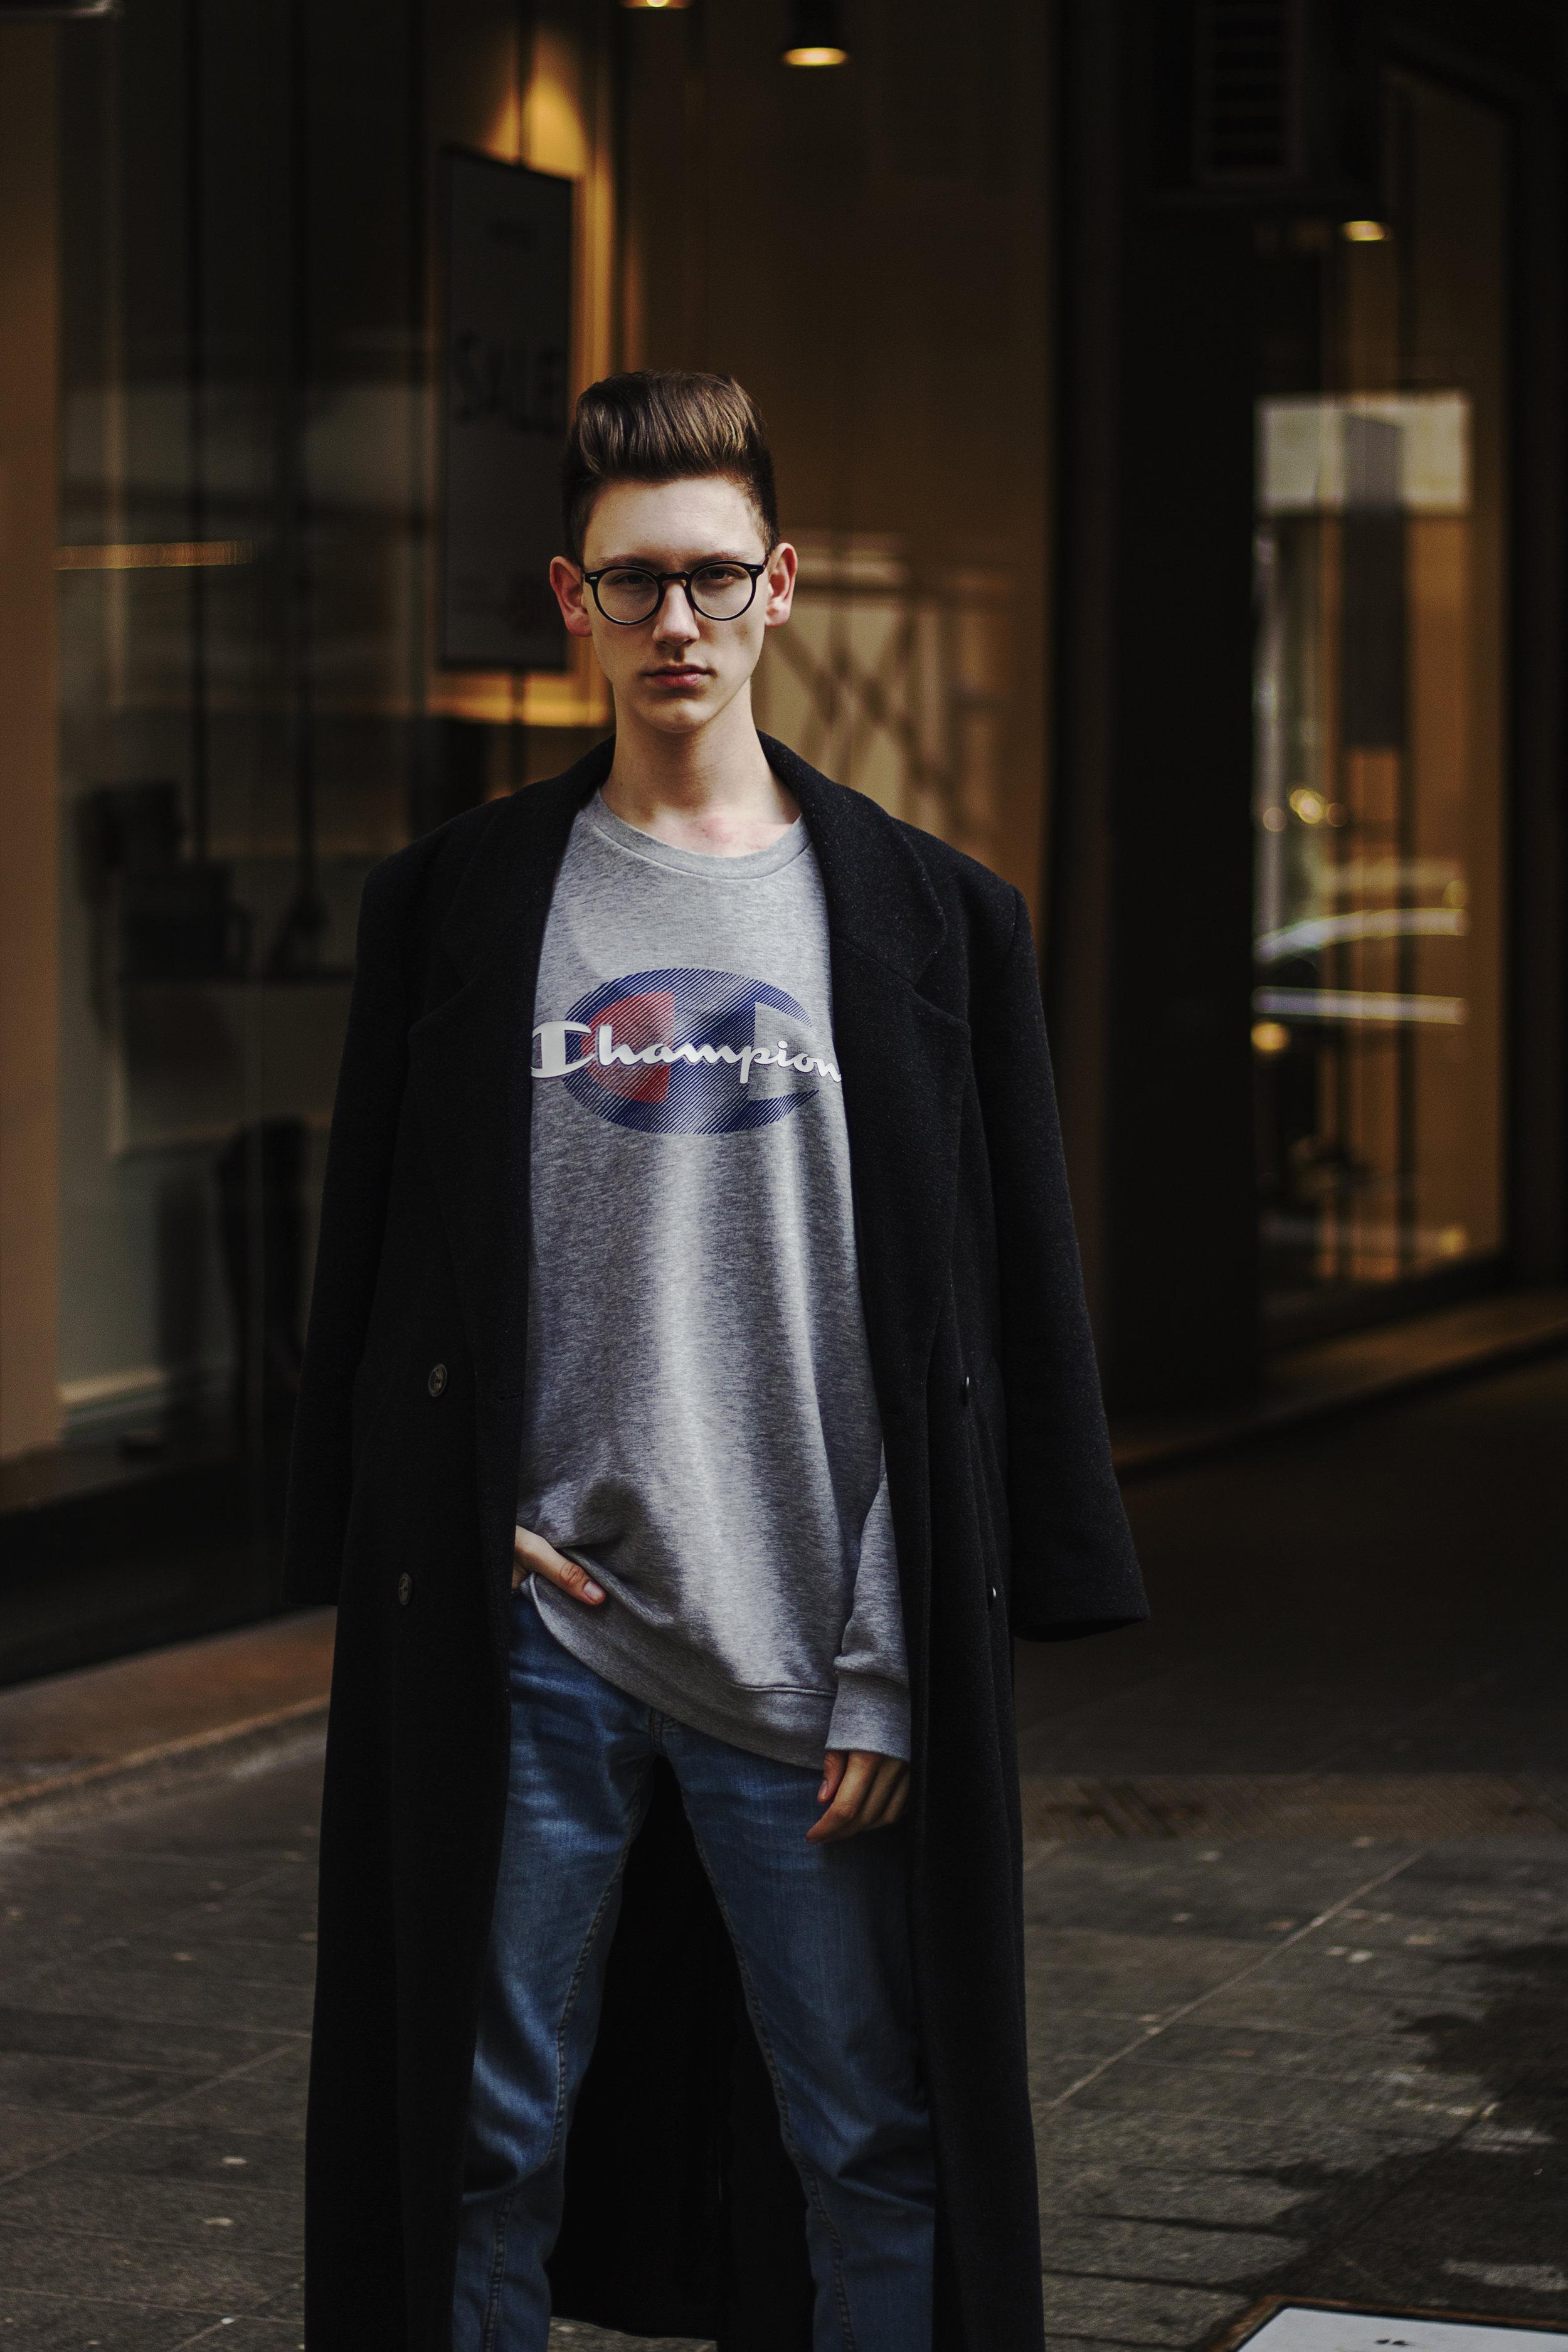 luka-lajic-expensive-reality-champion-hm-coat-boots-mens-fashion-croatia-blogger  (5).jpg